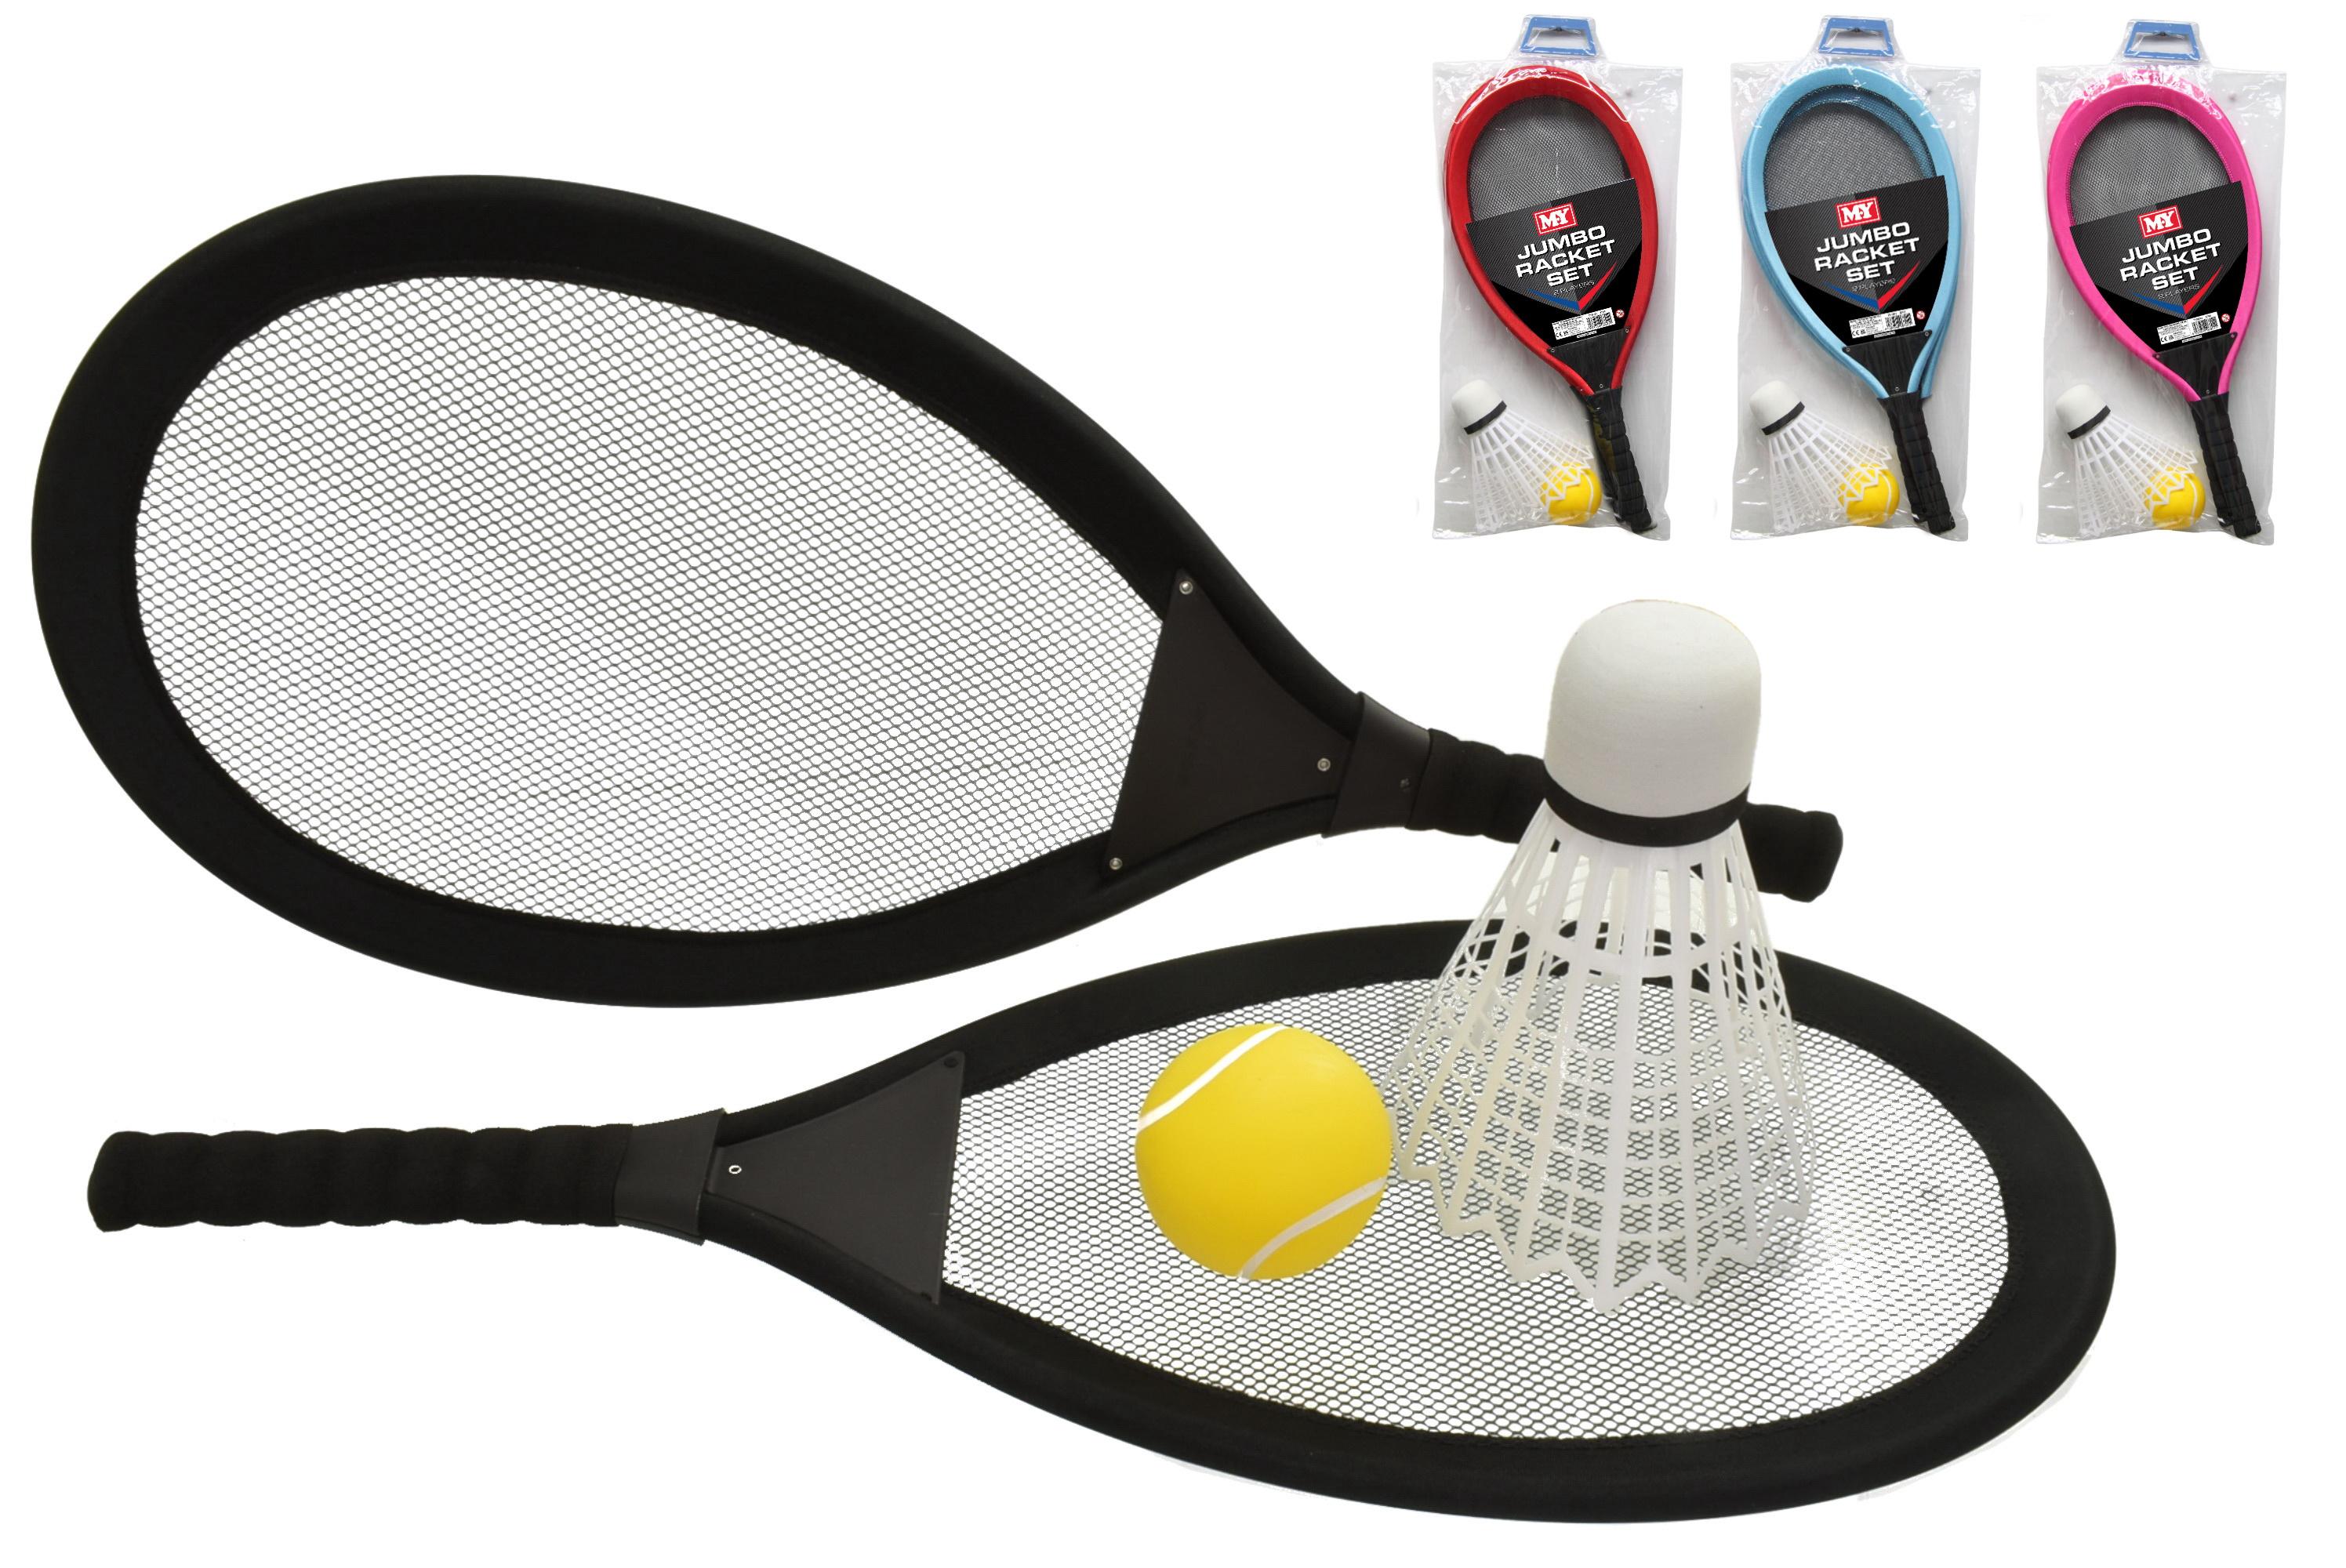 Jumbo Racket Set - 4 Asst Colours